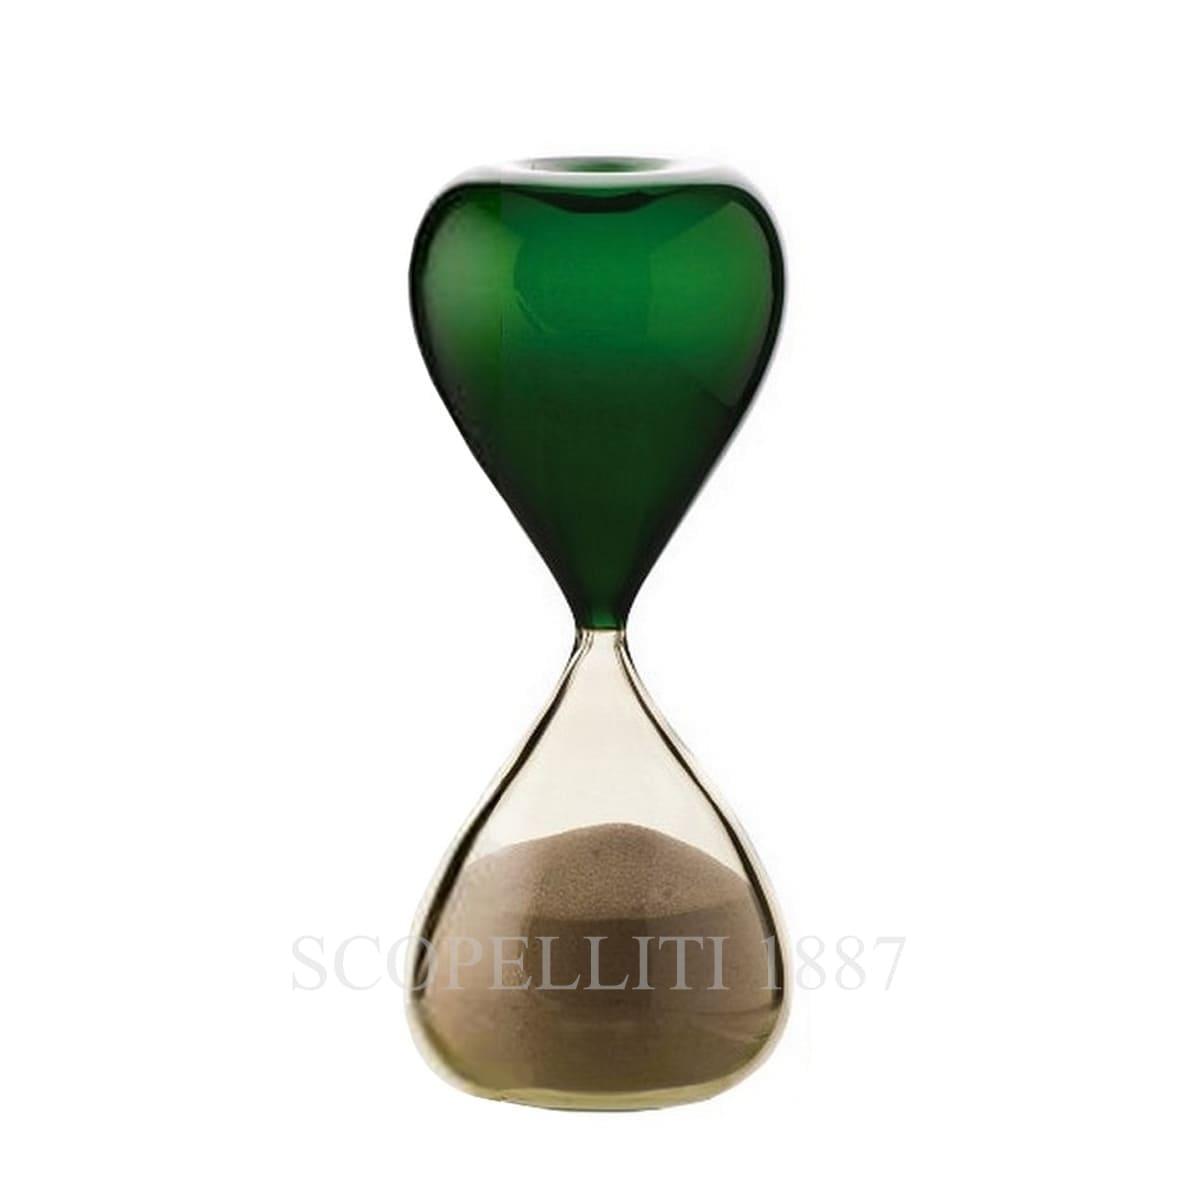 venini clessidre hourglass italian design green apple straw yellow limited edition